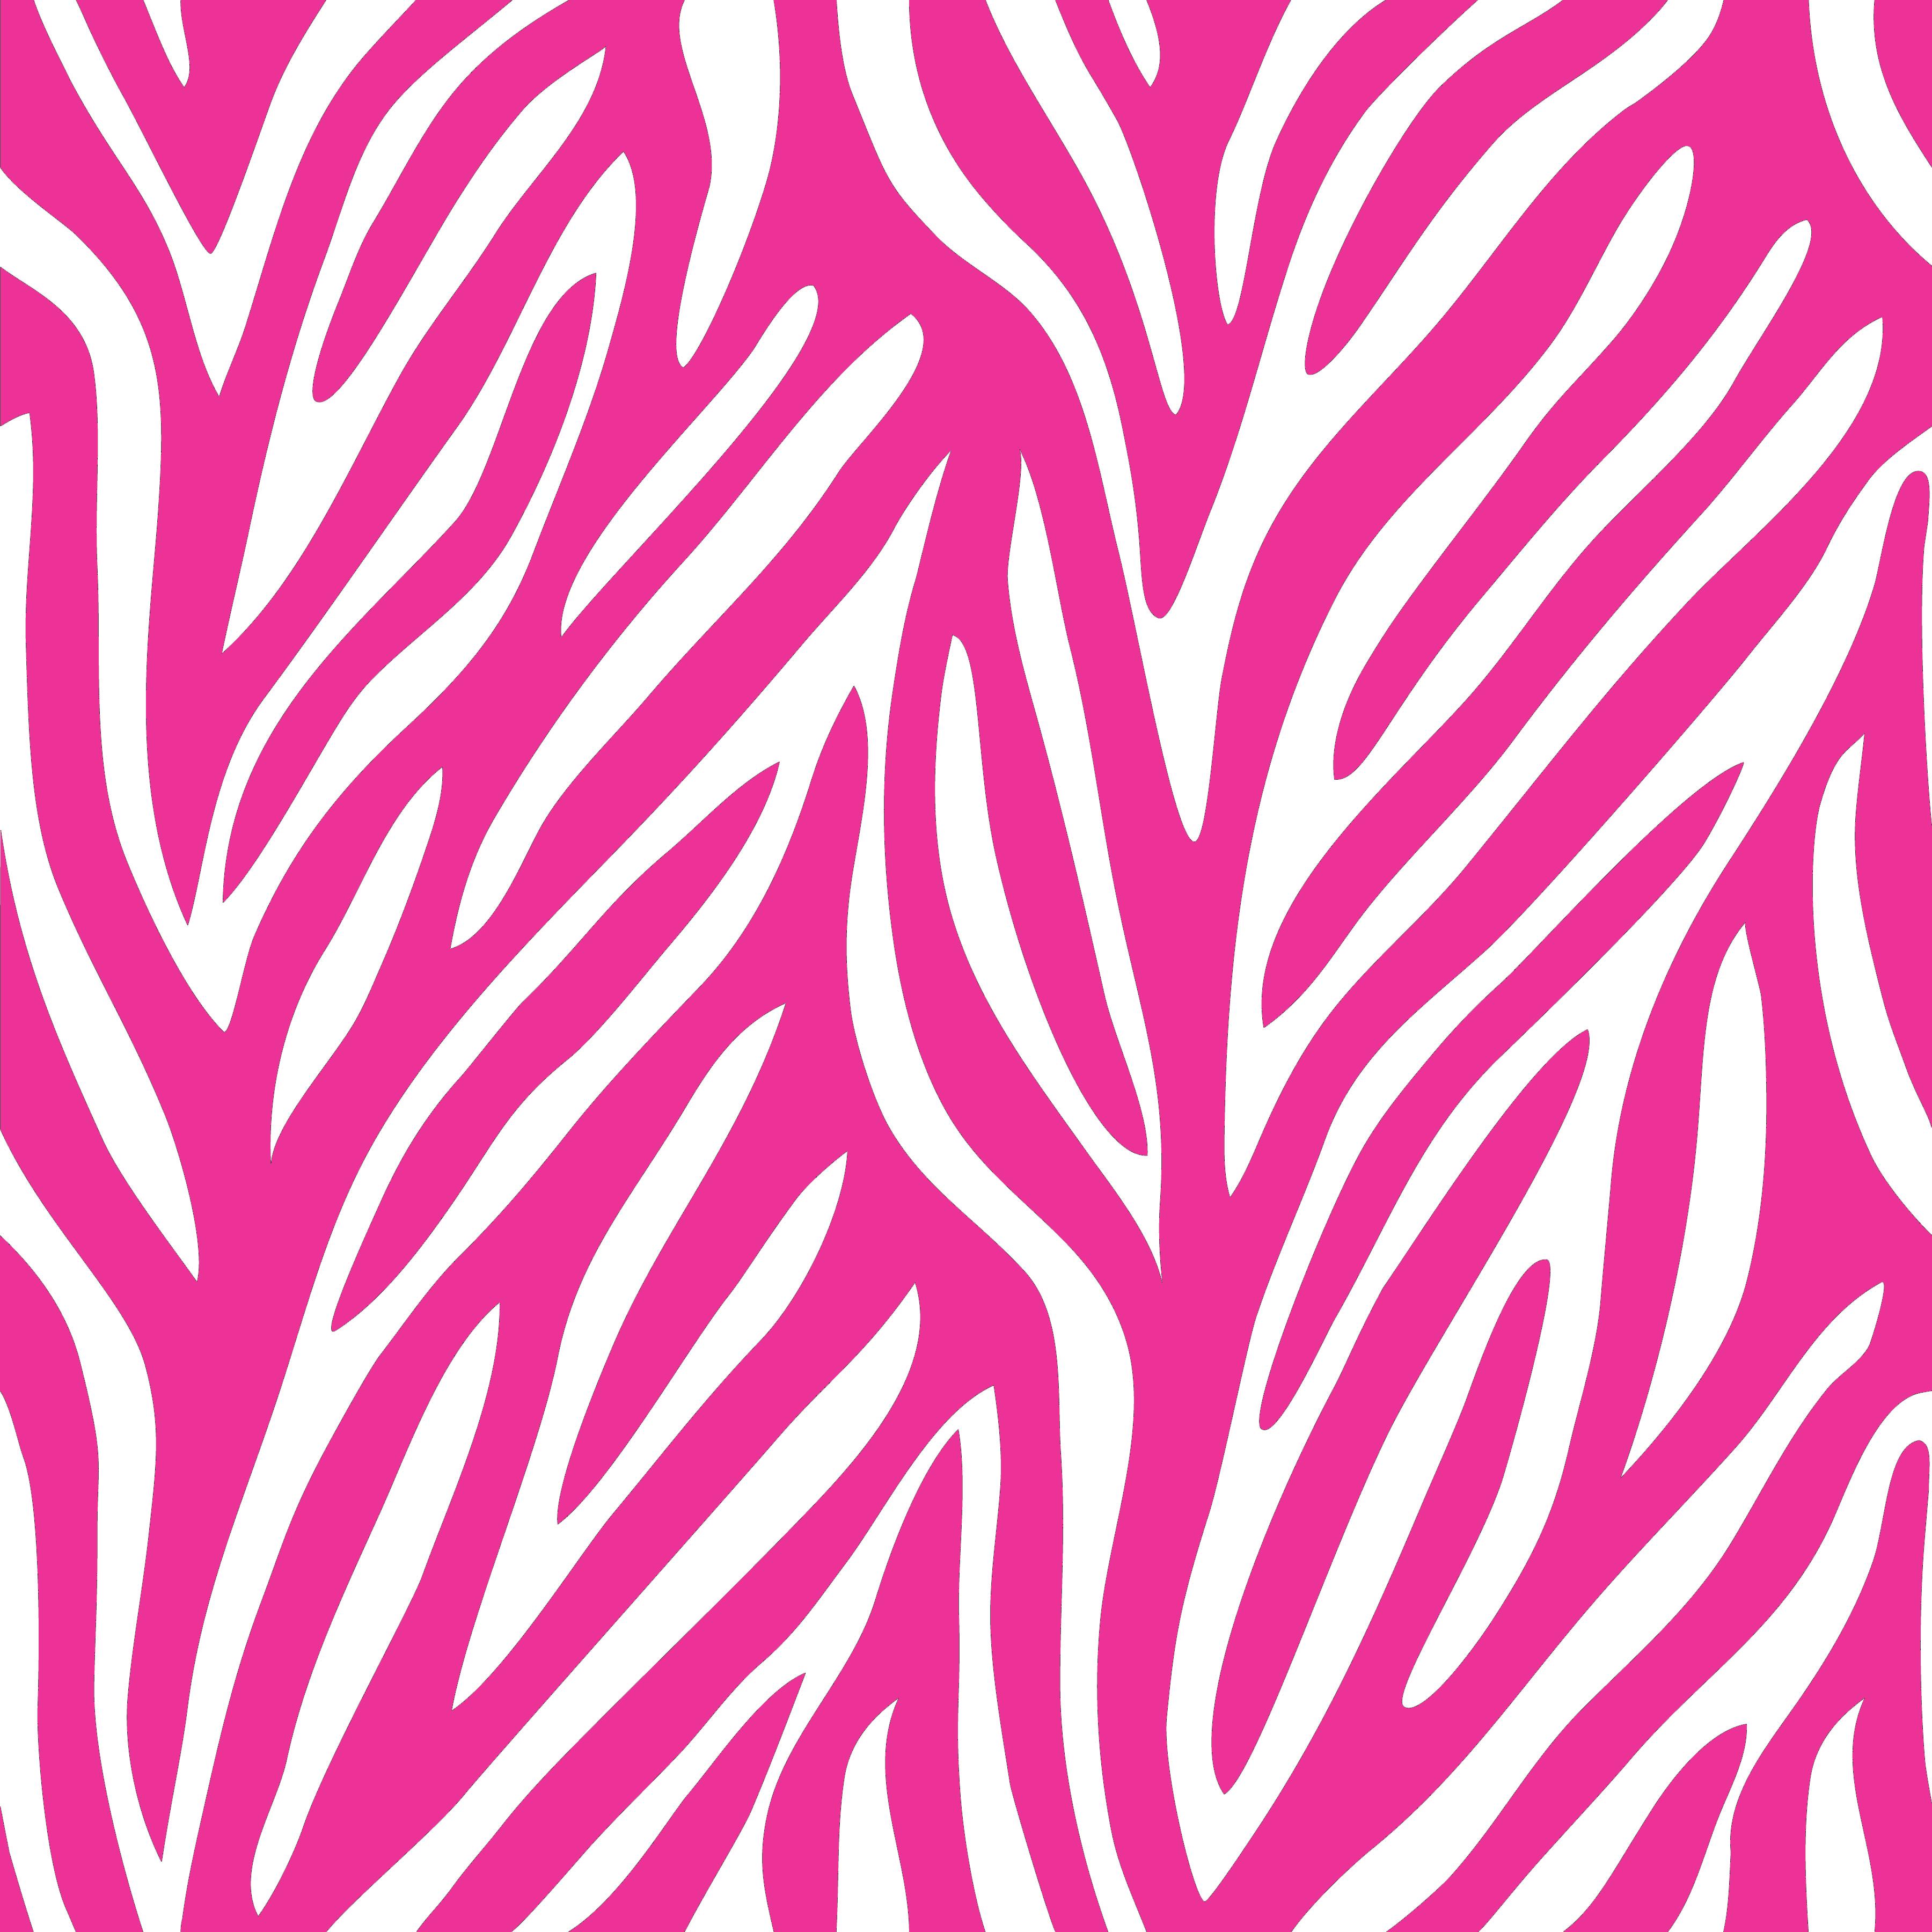 Zebra patterned wallpaper -  White Leopard Wallpaper Wallpapersafari Pink Zebra Wallpaper Pink Zebra Print 6955469